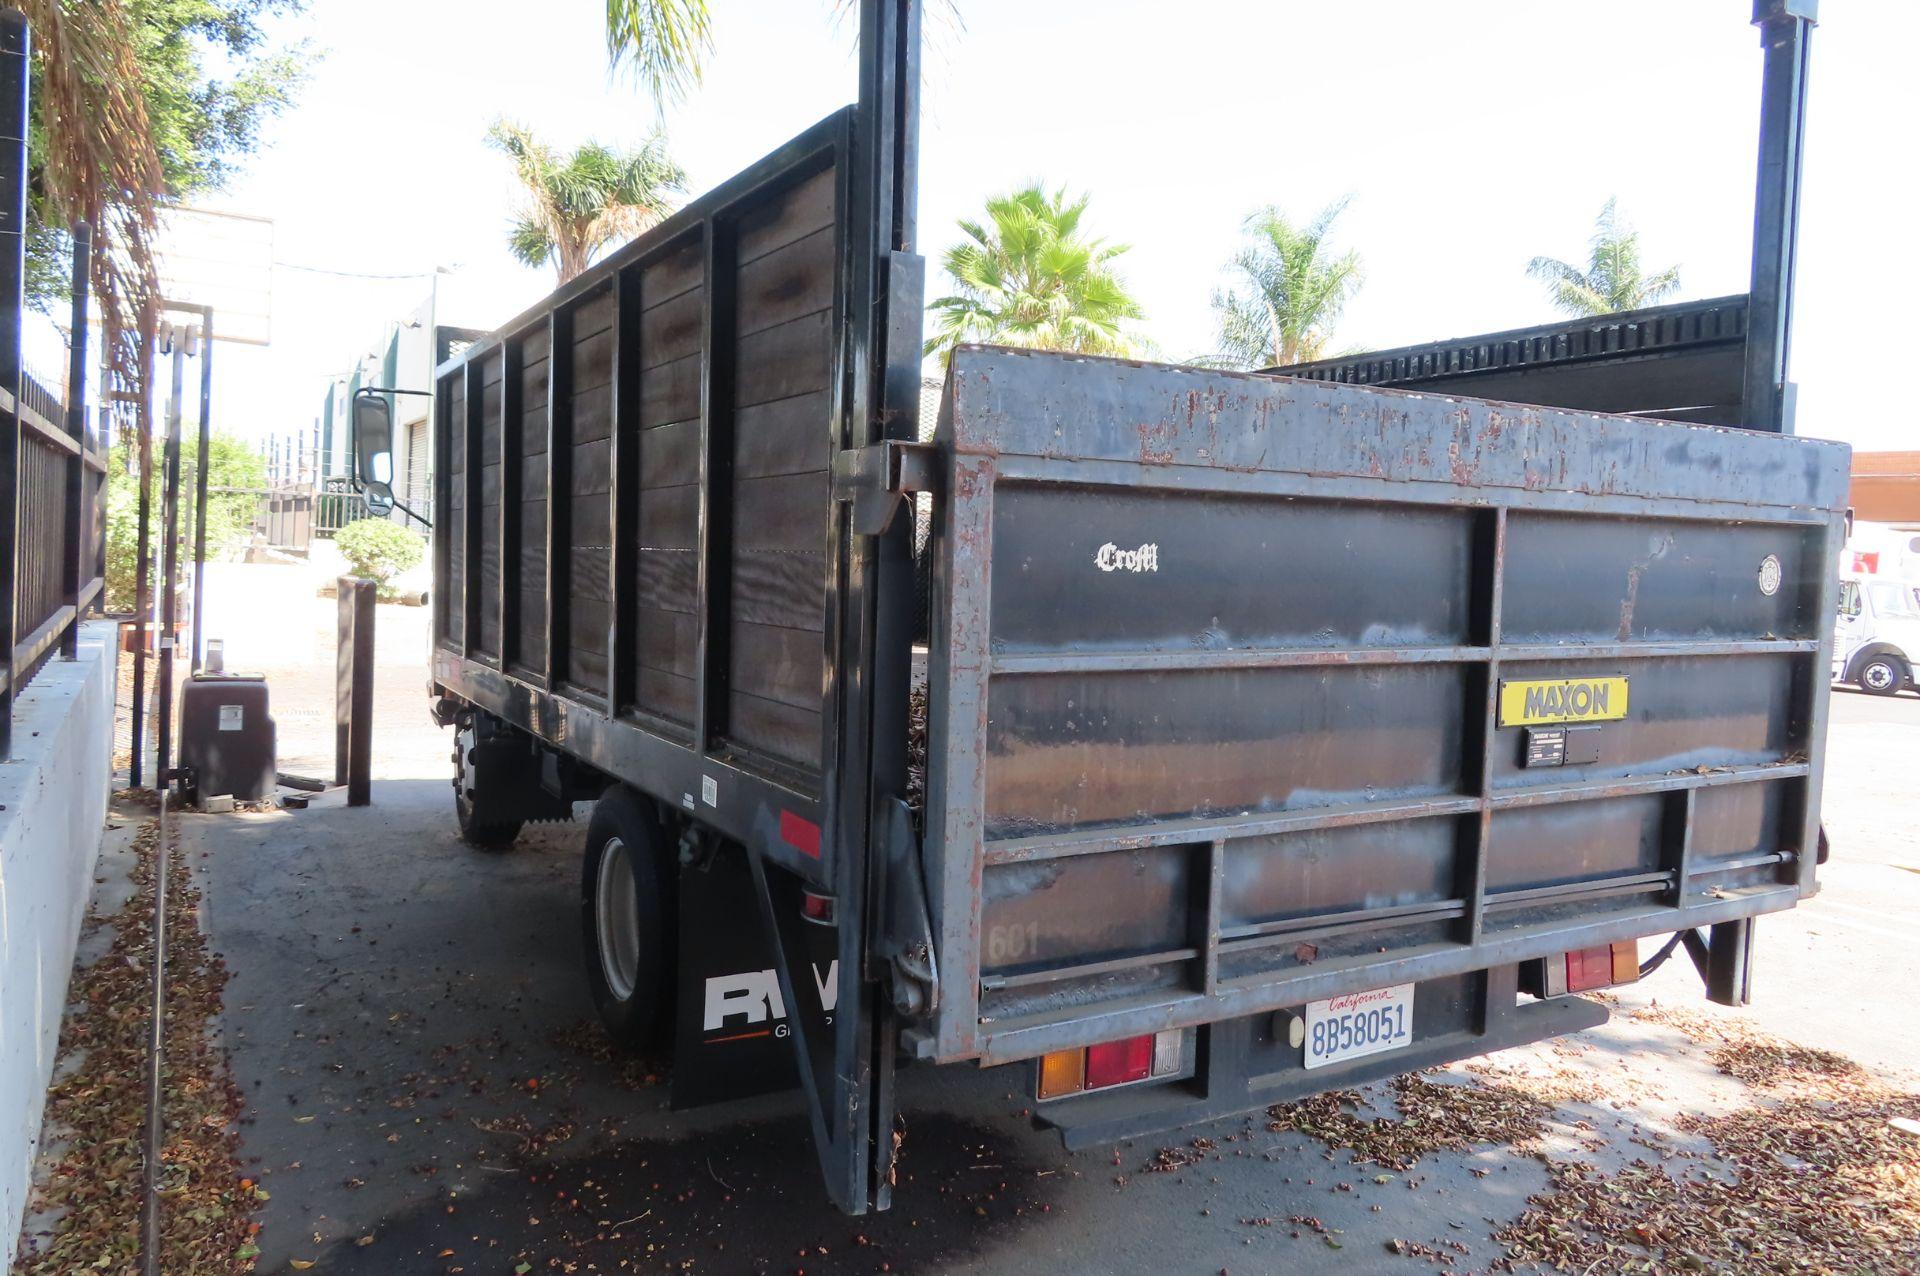 2006 Isuzu flat bed truck - Image 3 of 4